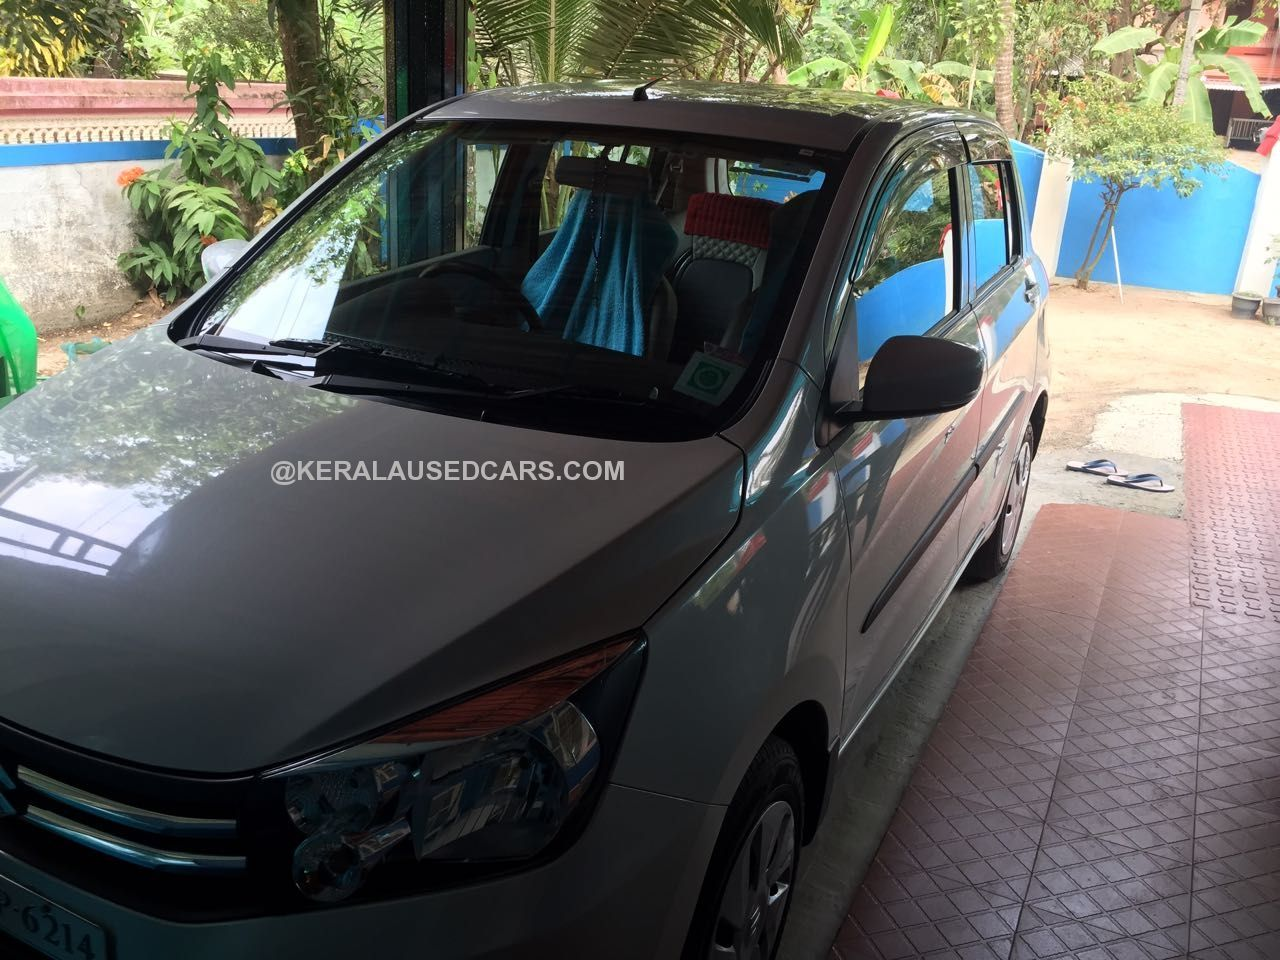 Suzuki Celerio Price 5 4 Lac 2016 Petrol 4200 Km Km 1st Owner